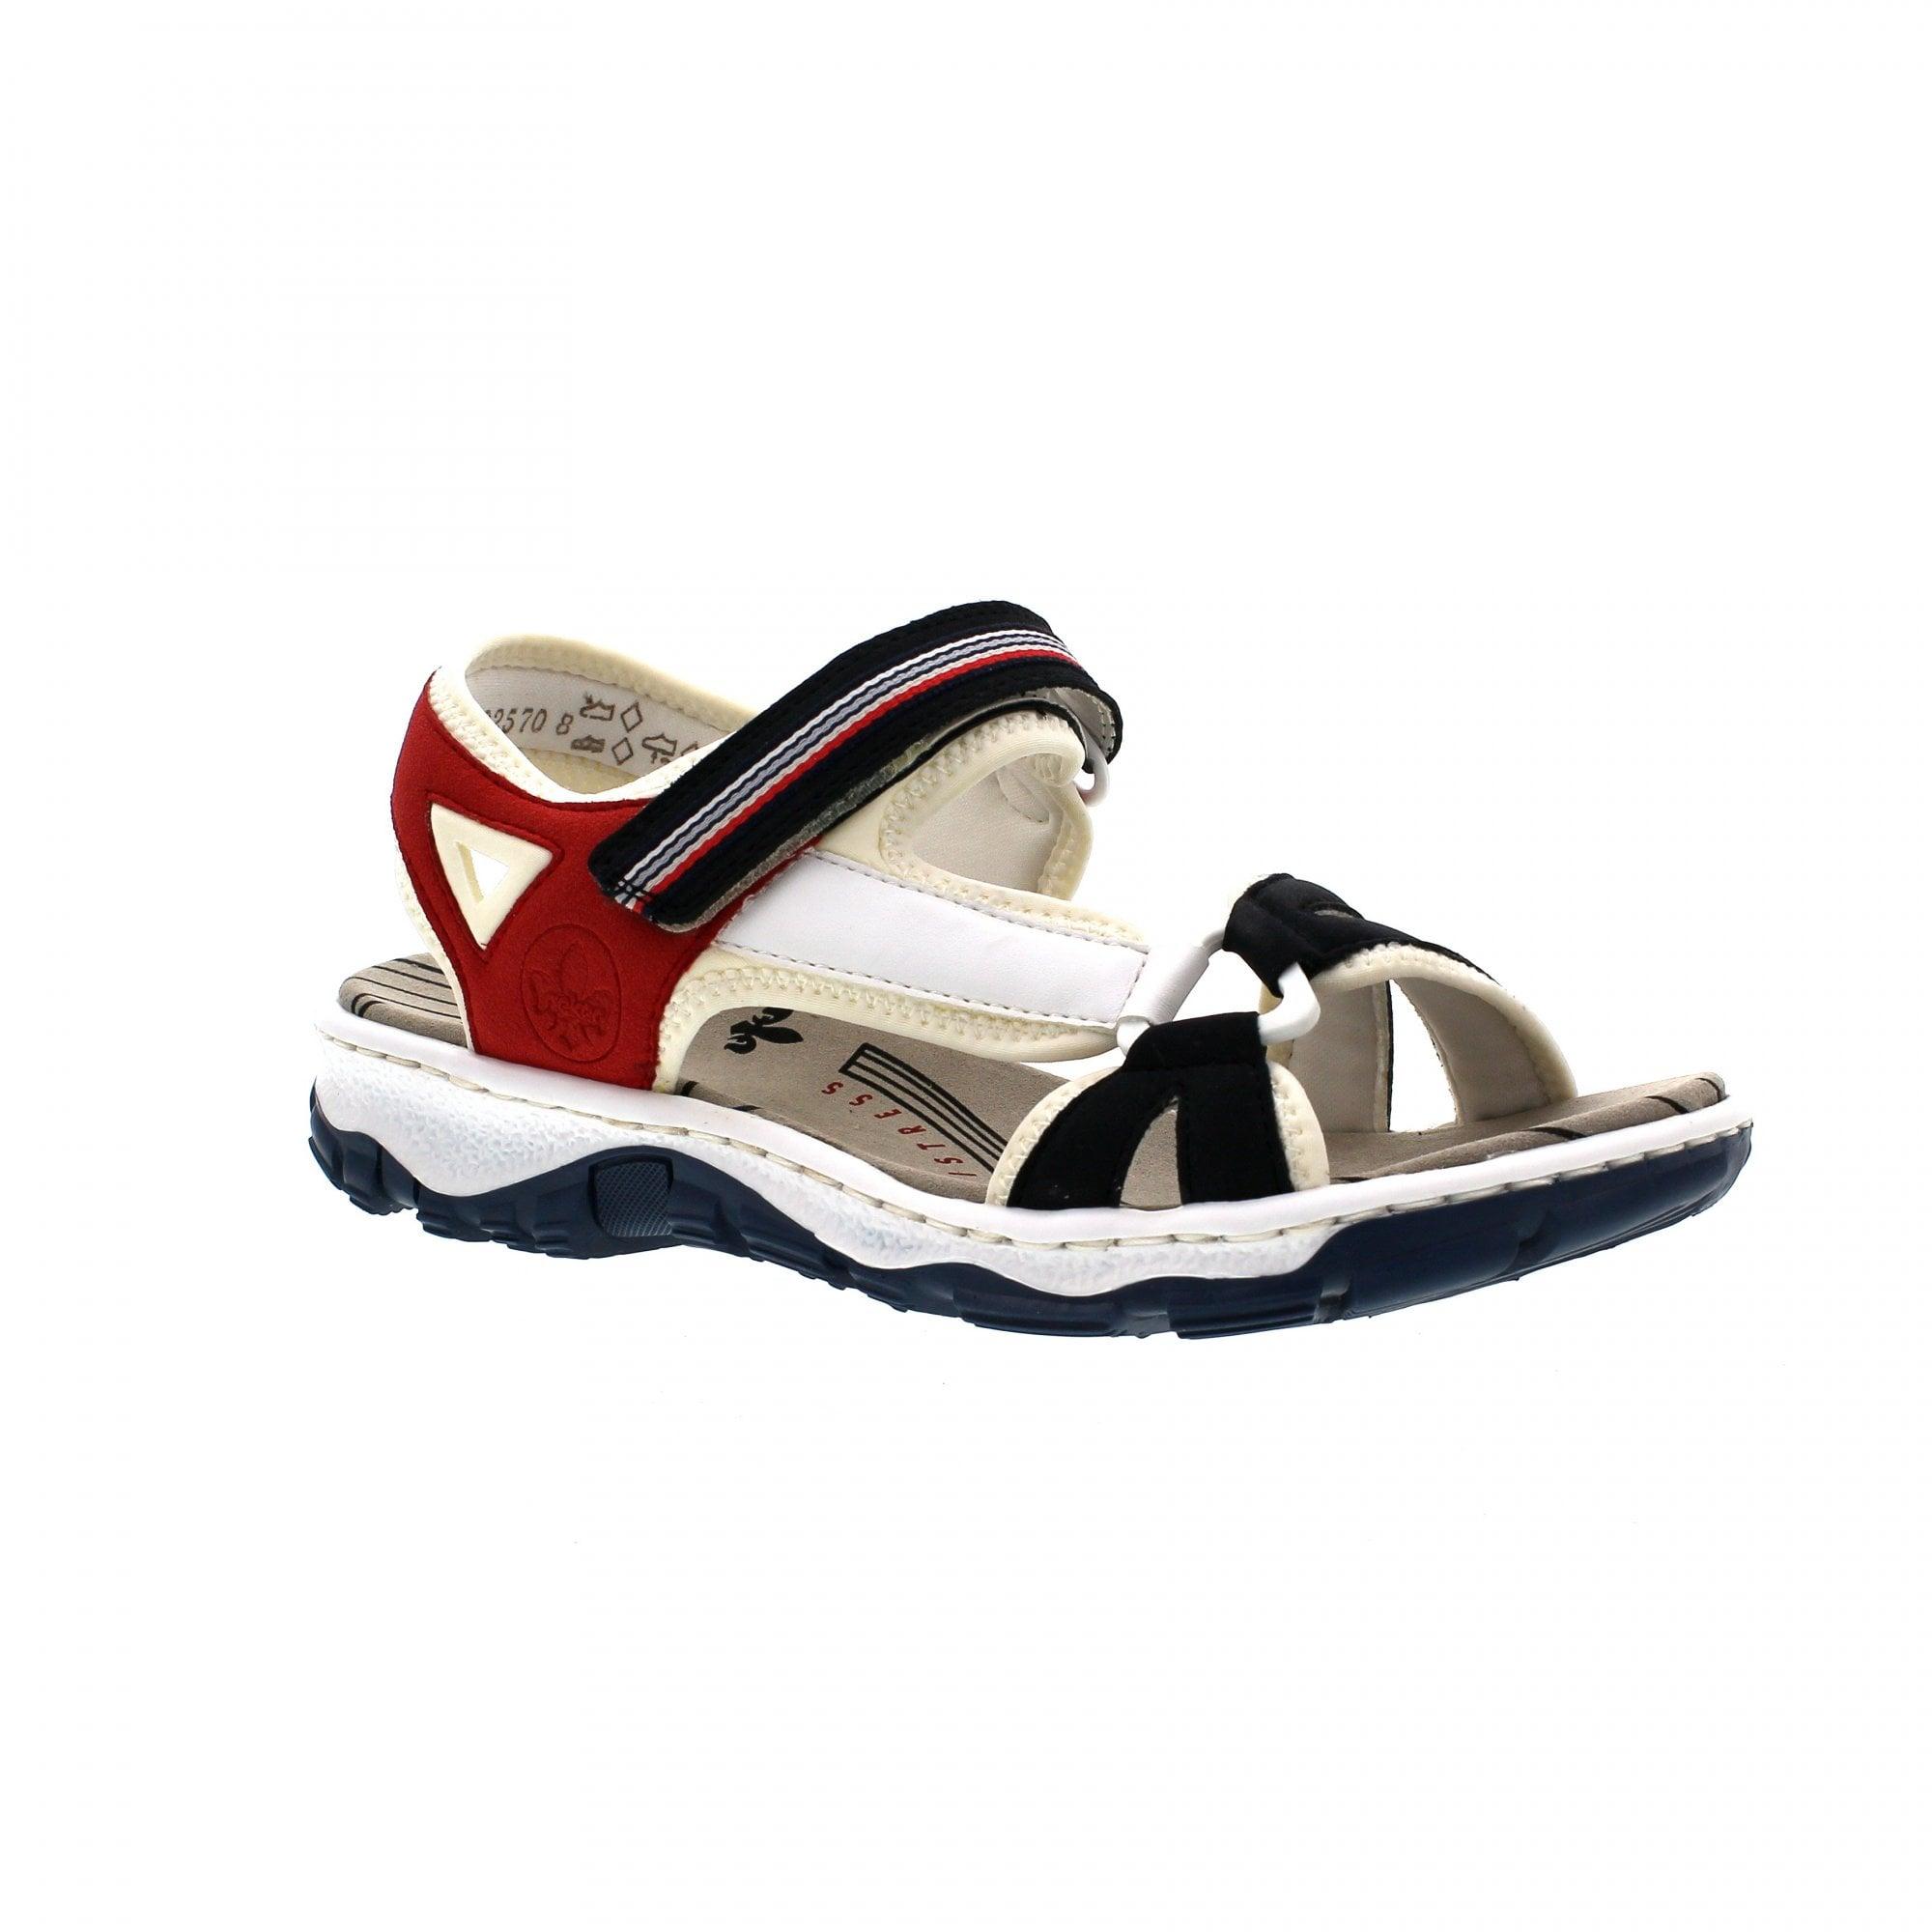 Rieker 68877-15 Womens Walking Sandals